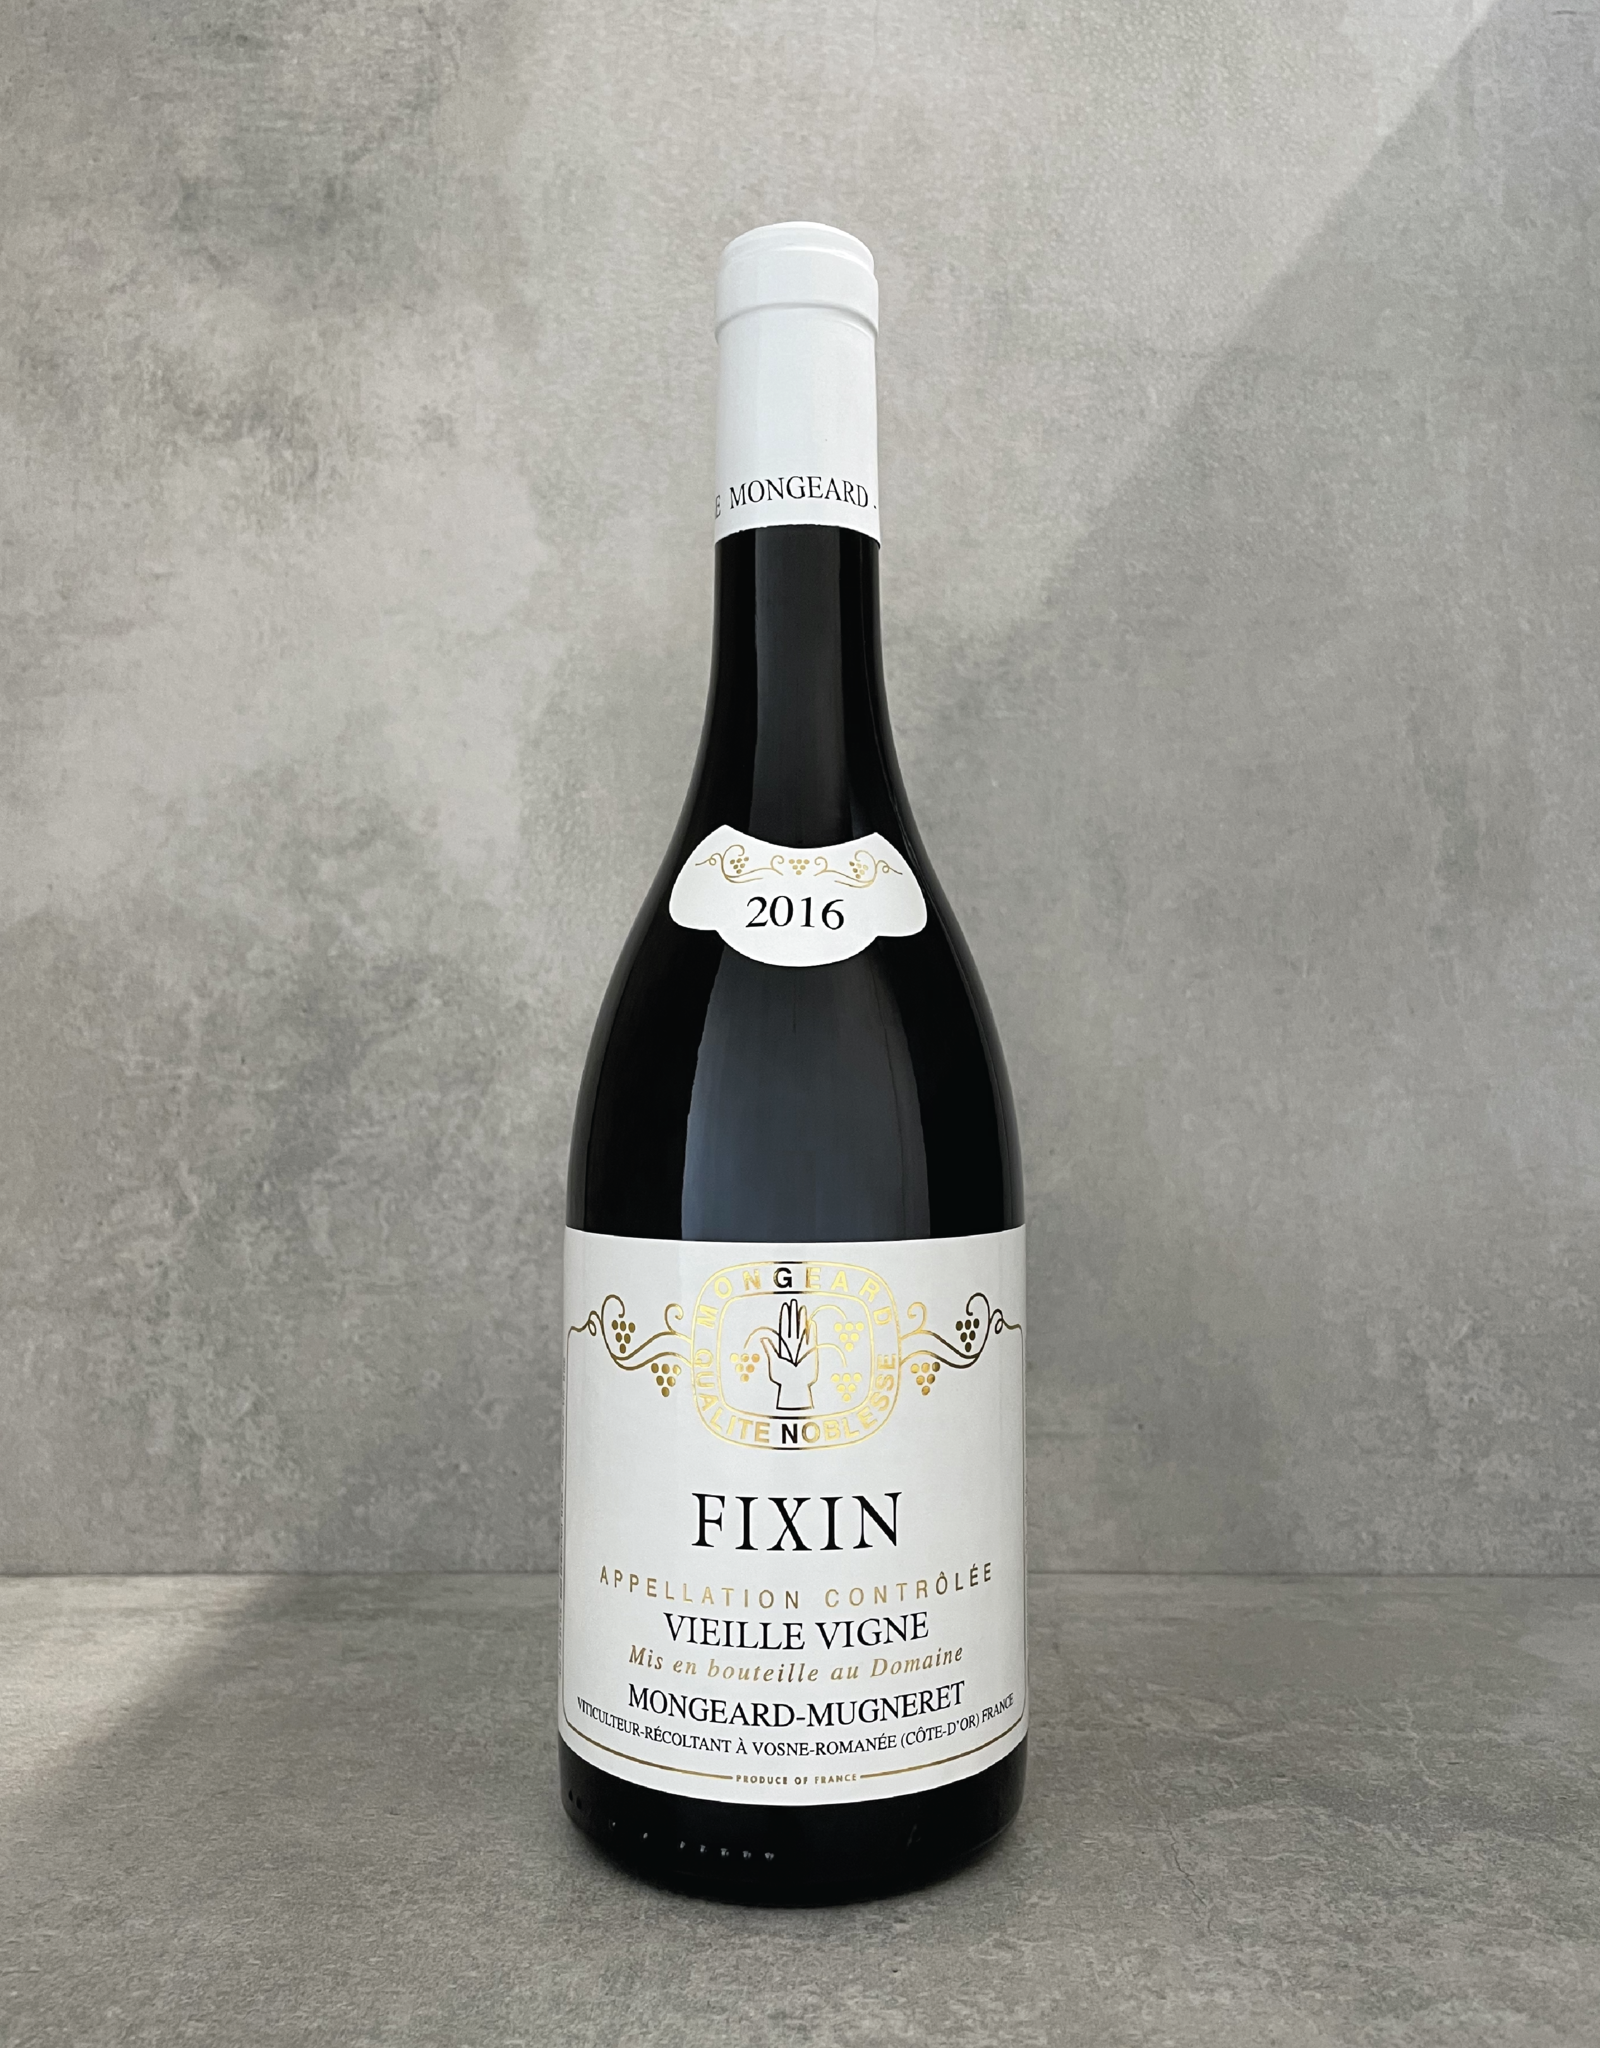 Mongeard-Mugneret Fixin vieille vigne 2017